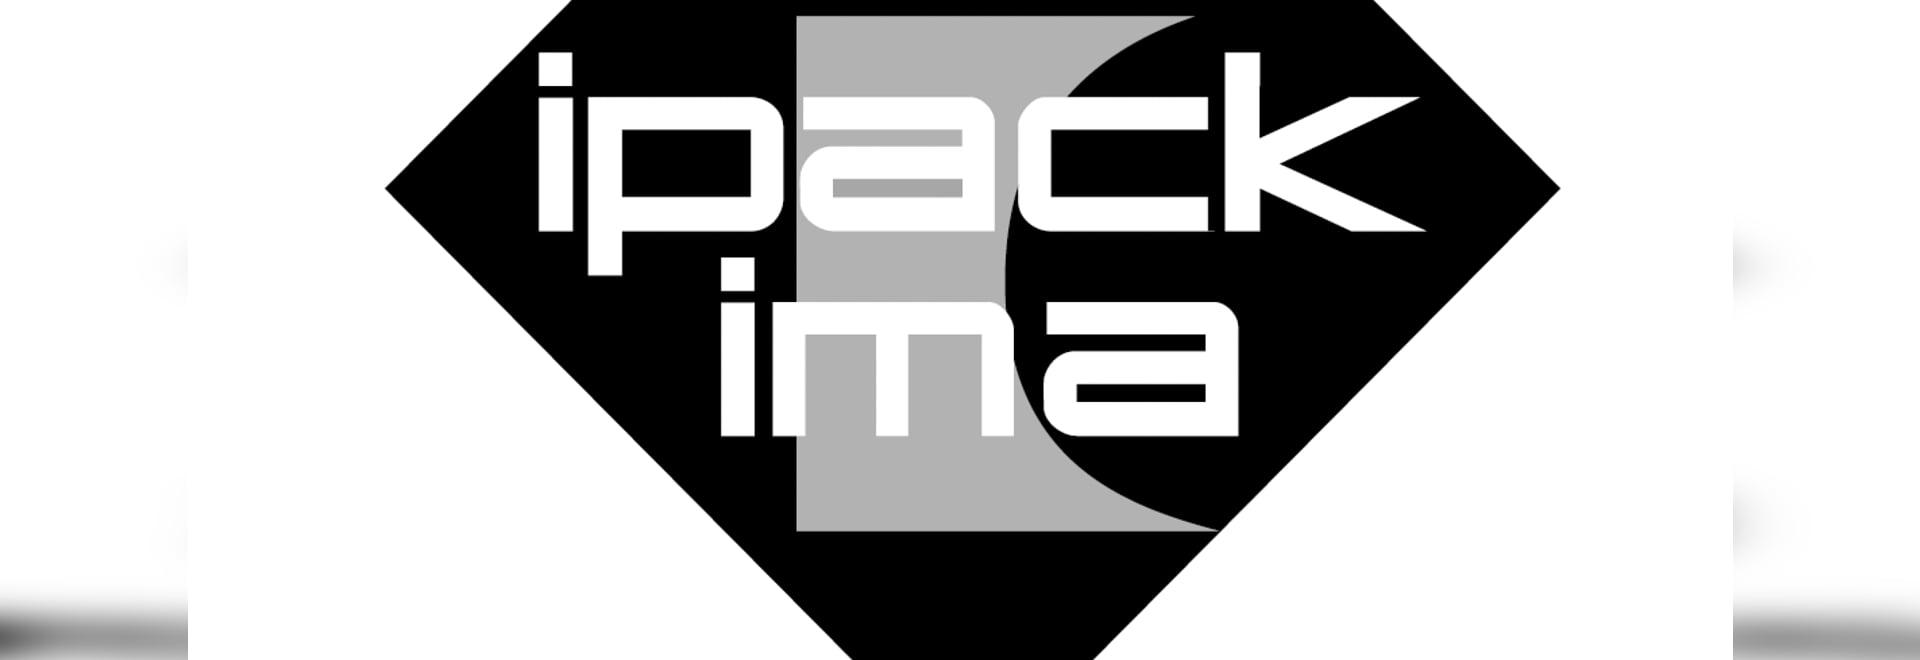 IPACK-IMA 2018